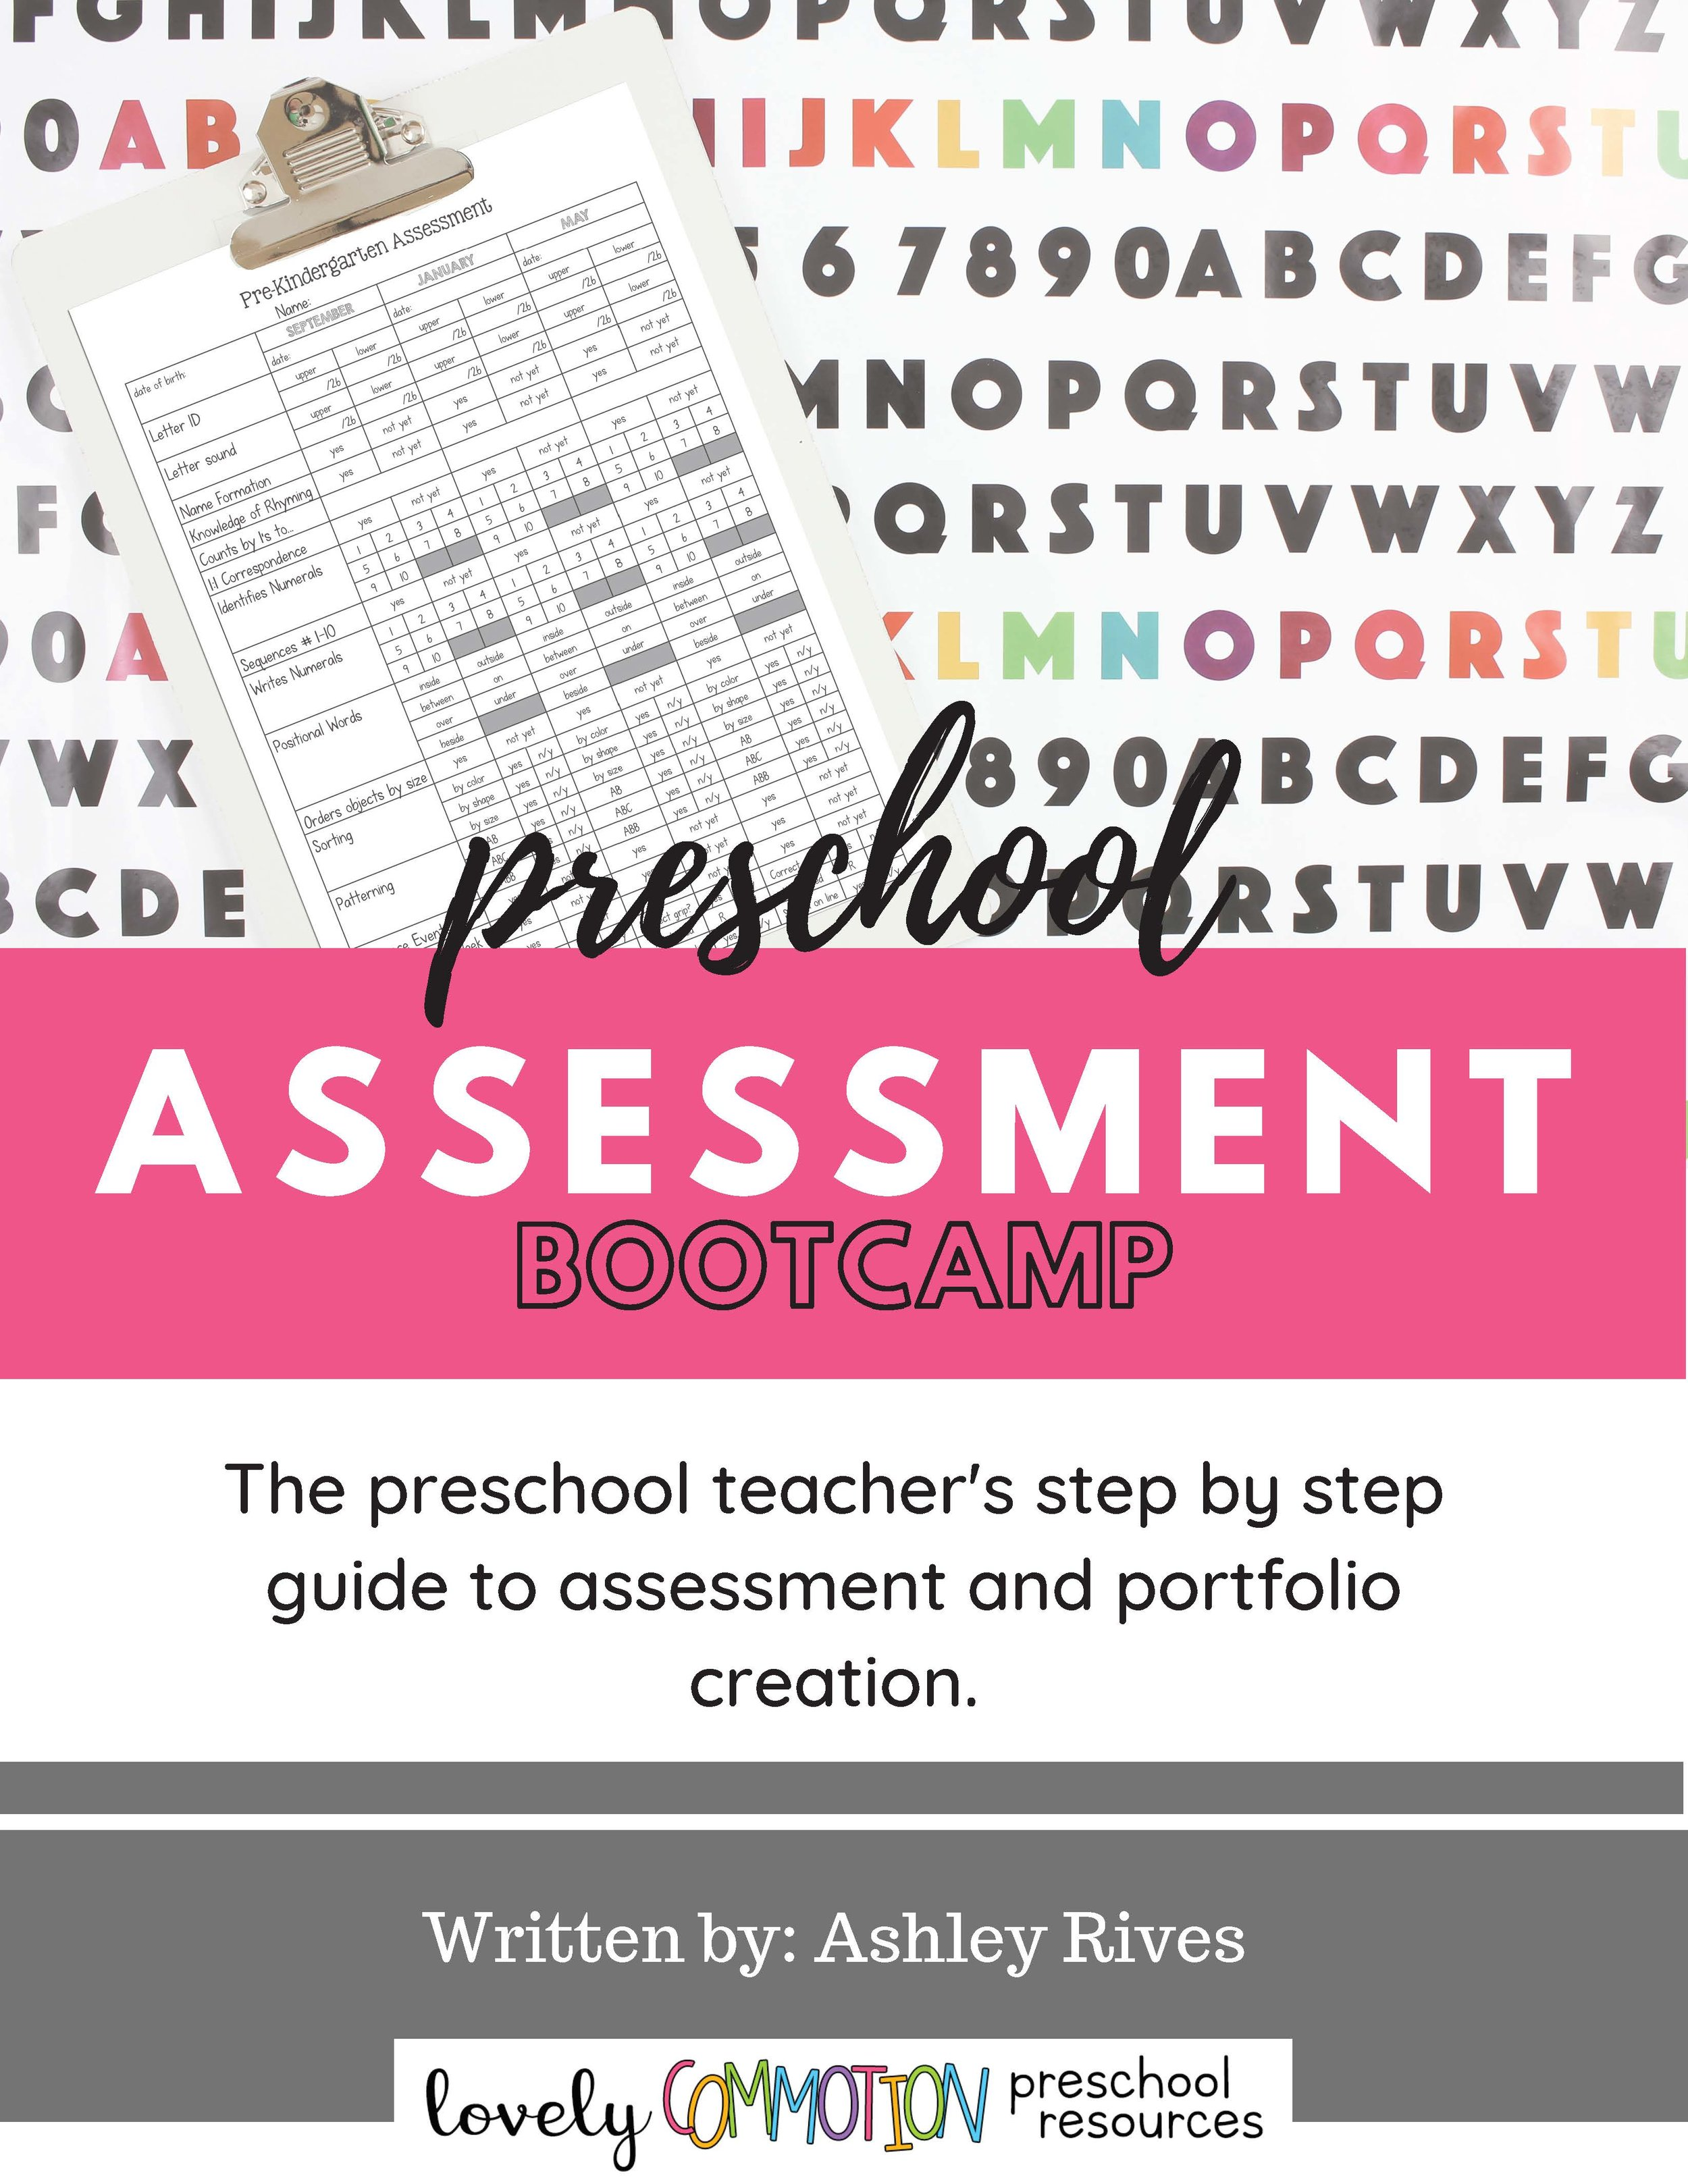 Preschool Assessment Bootcamp Ebook_Page_01.jpg